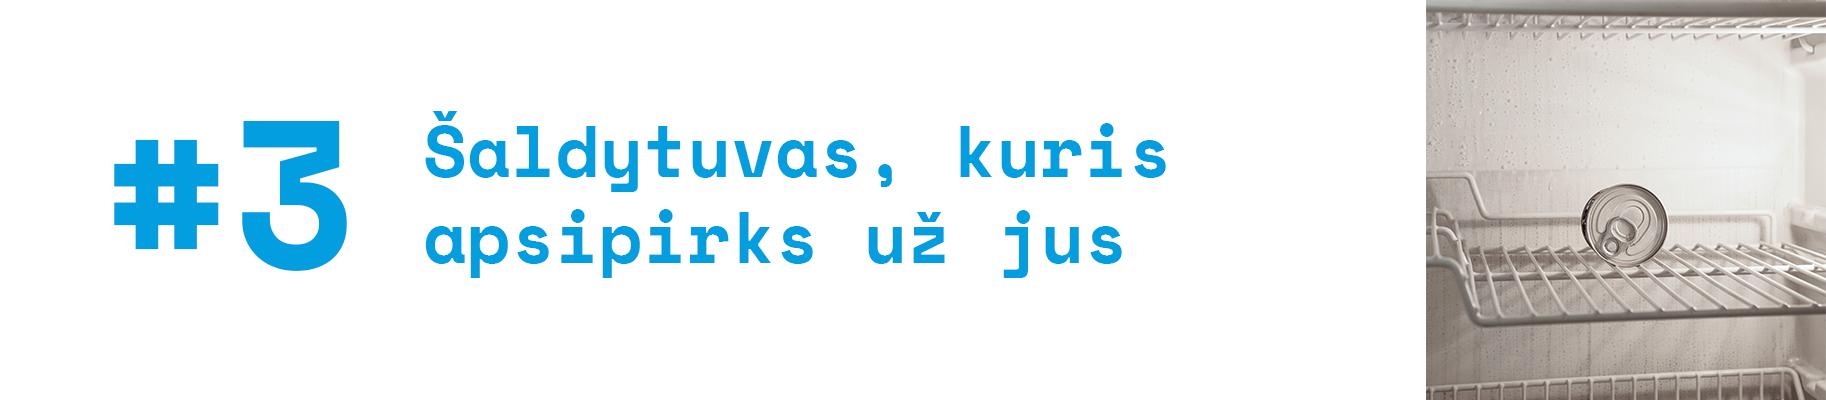 Inovaciju-biuro-antrastes-su-img3